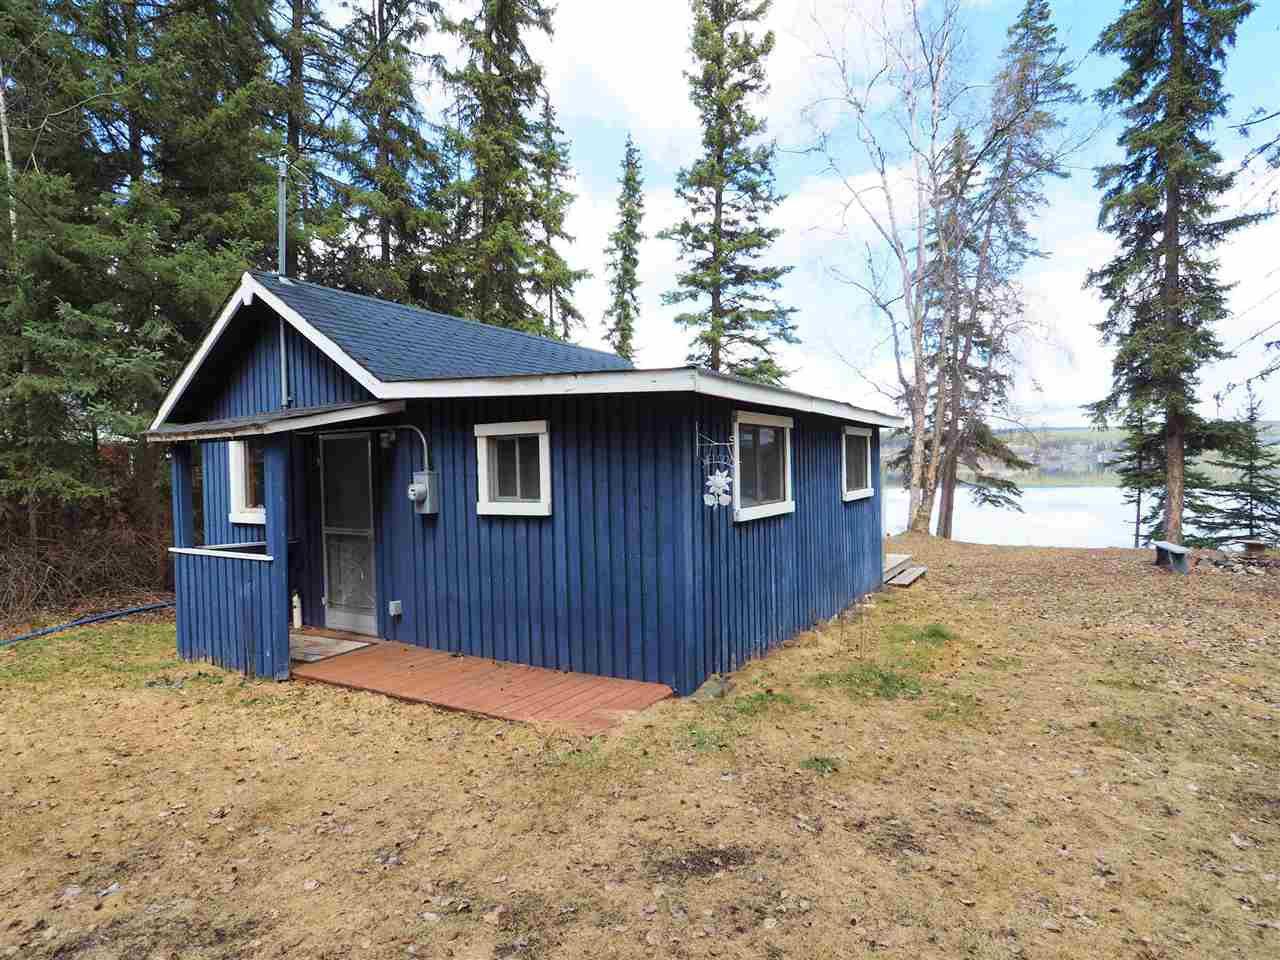 Main Photo: 4663 CAVERLY Road: Lac la Hache House for sale (100 Mile House (Zone 10))  : MLS®# R2364485